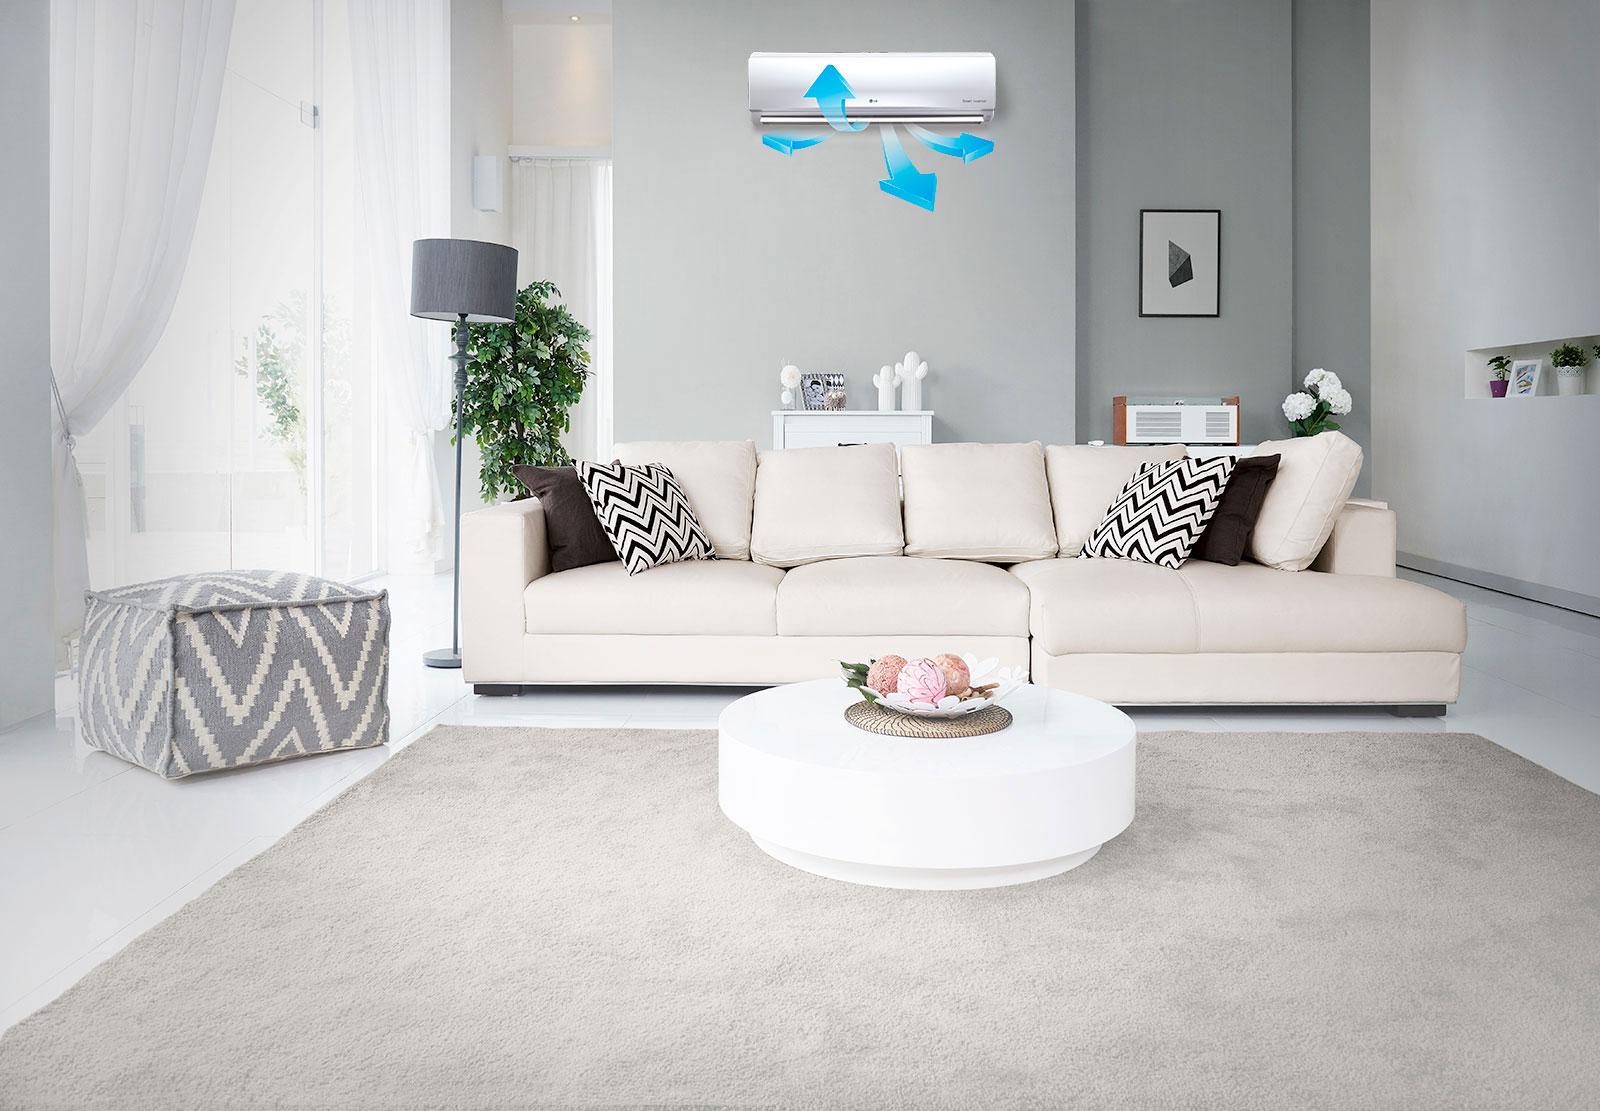 LG 4 Way Swing Split Air Conditioner